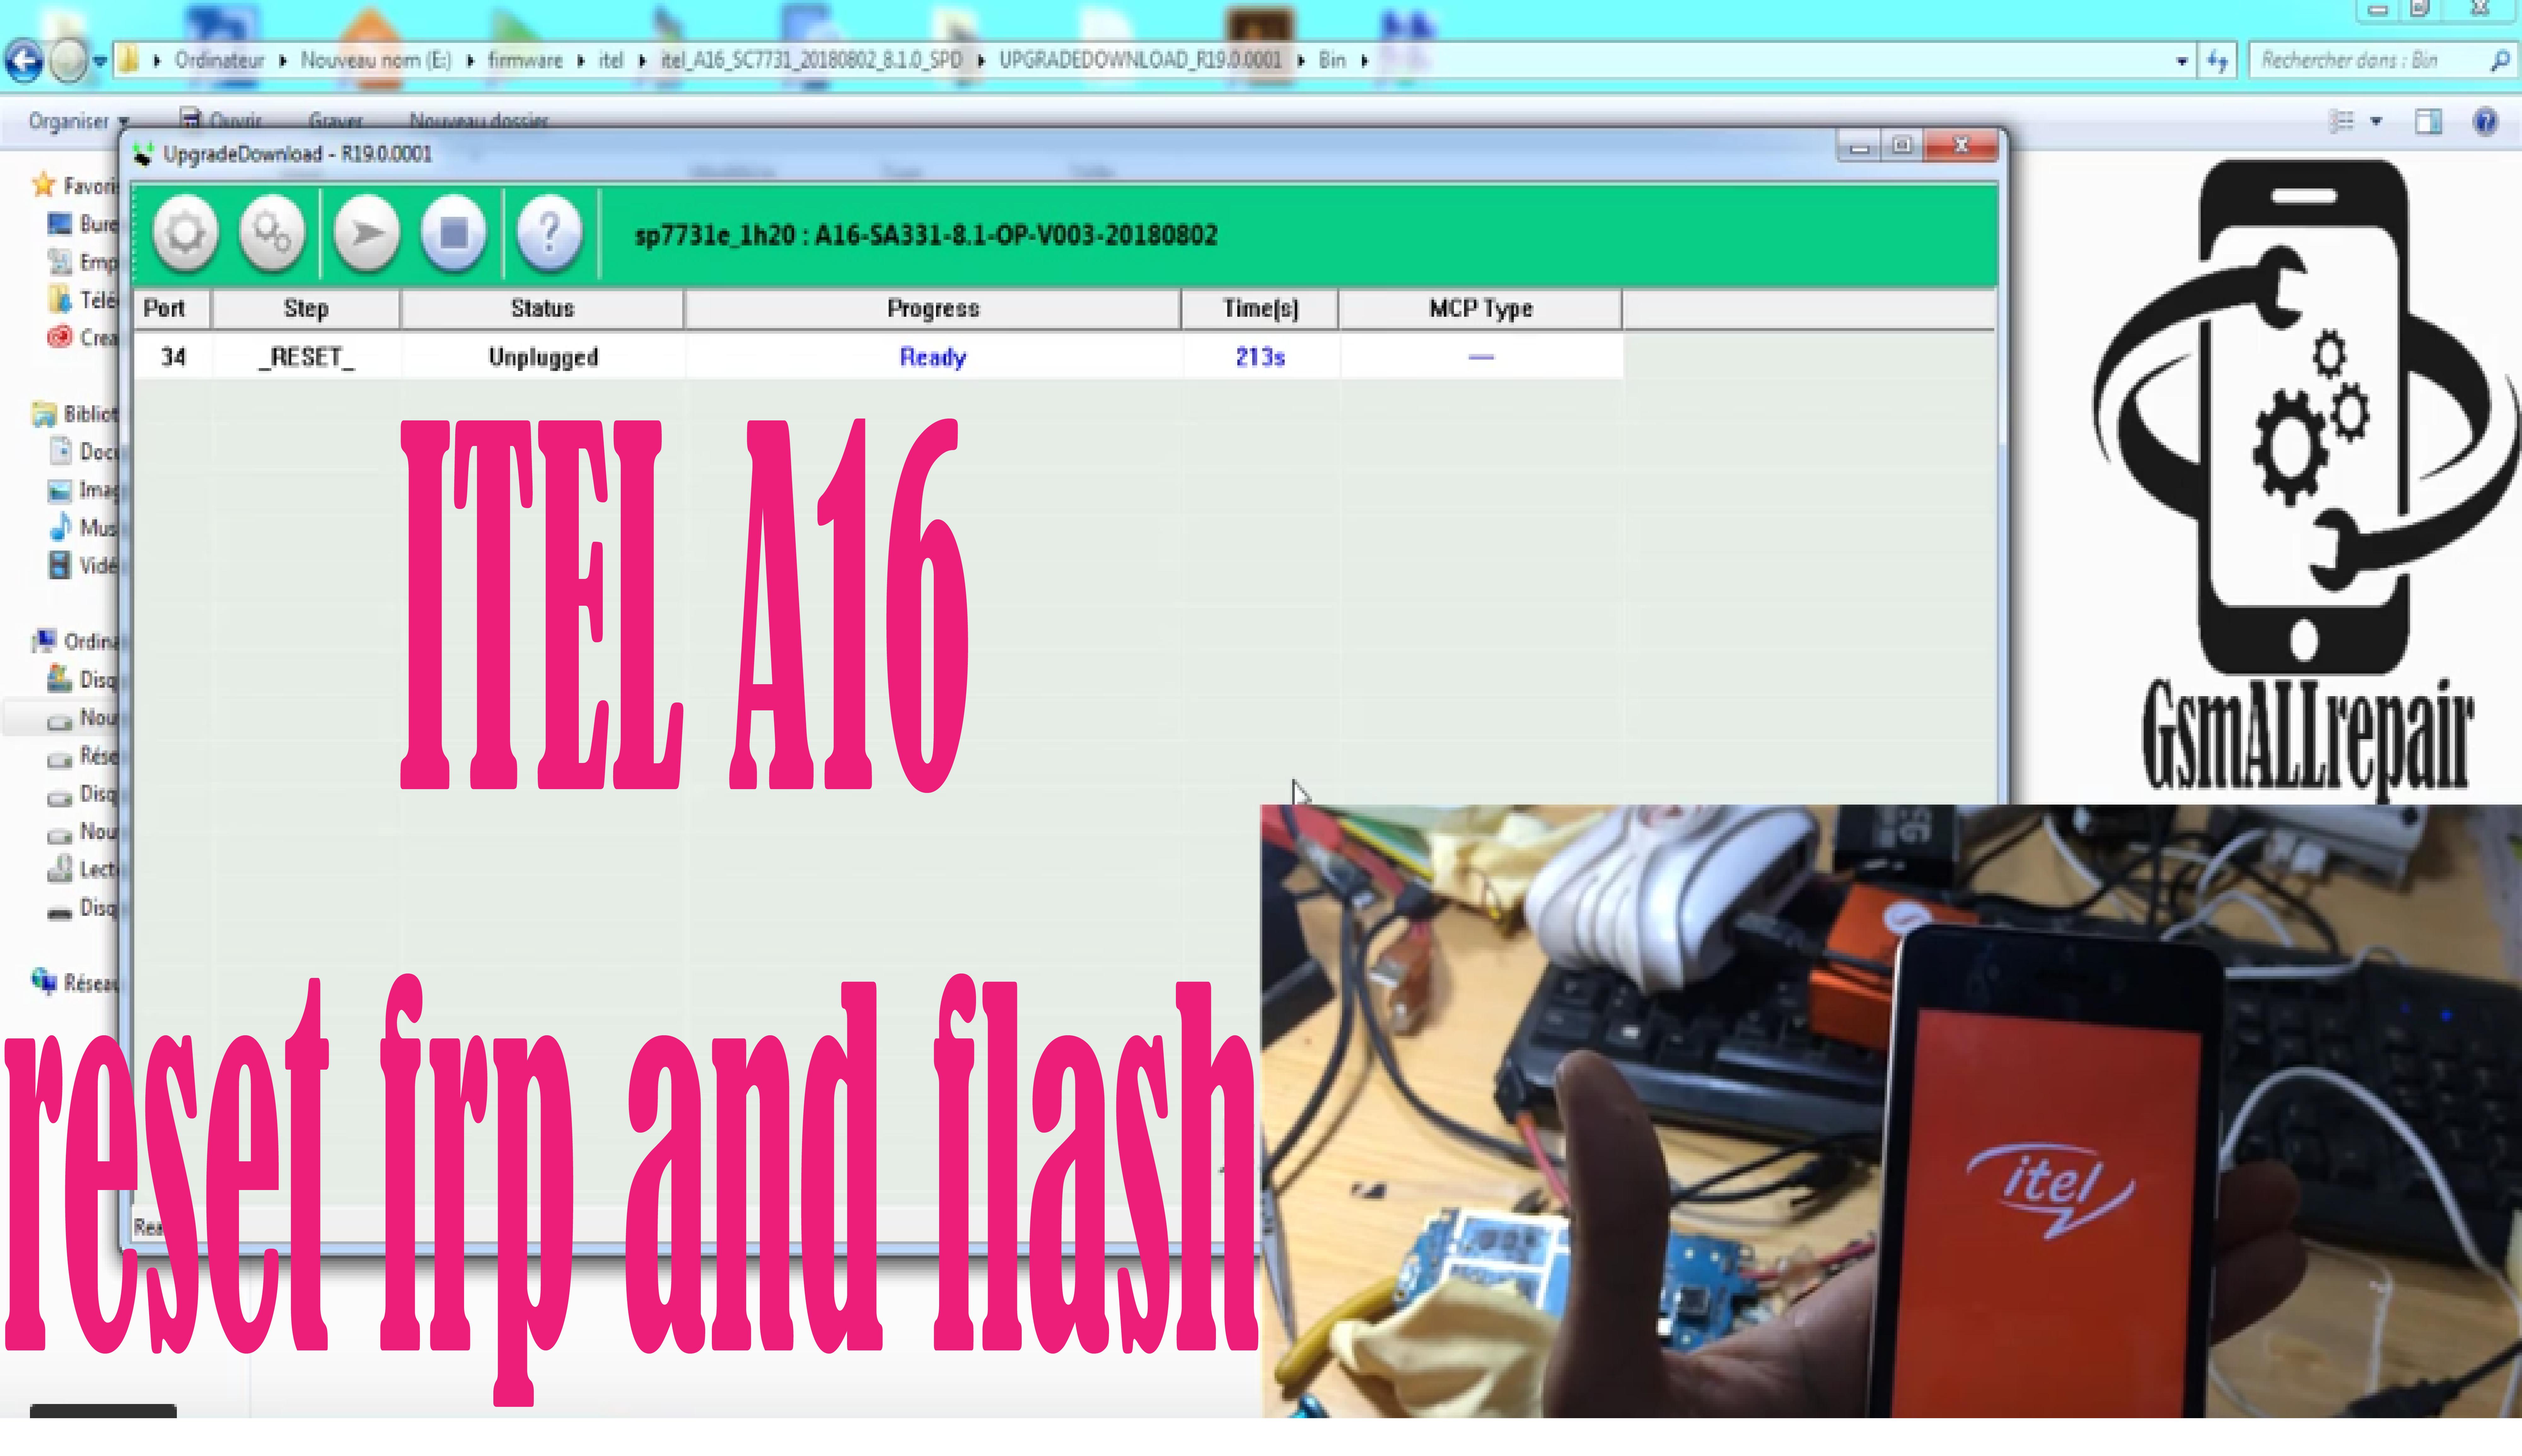 ITEL A16 reset frp and flash | ITEL FLASH en 2019